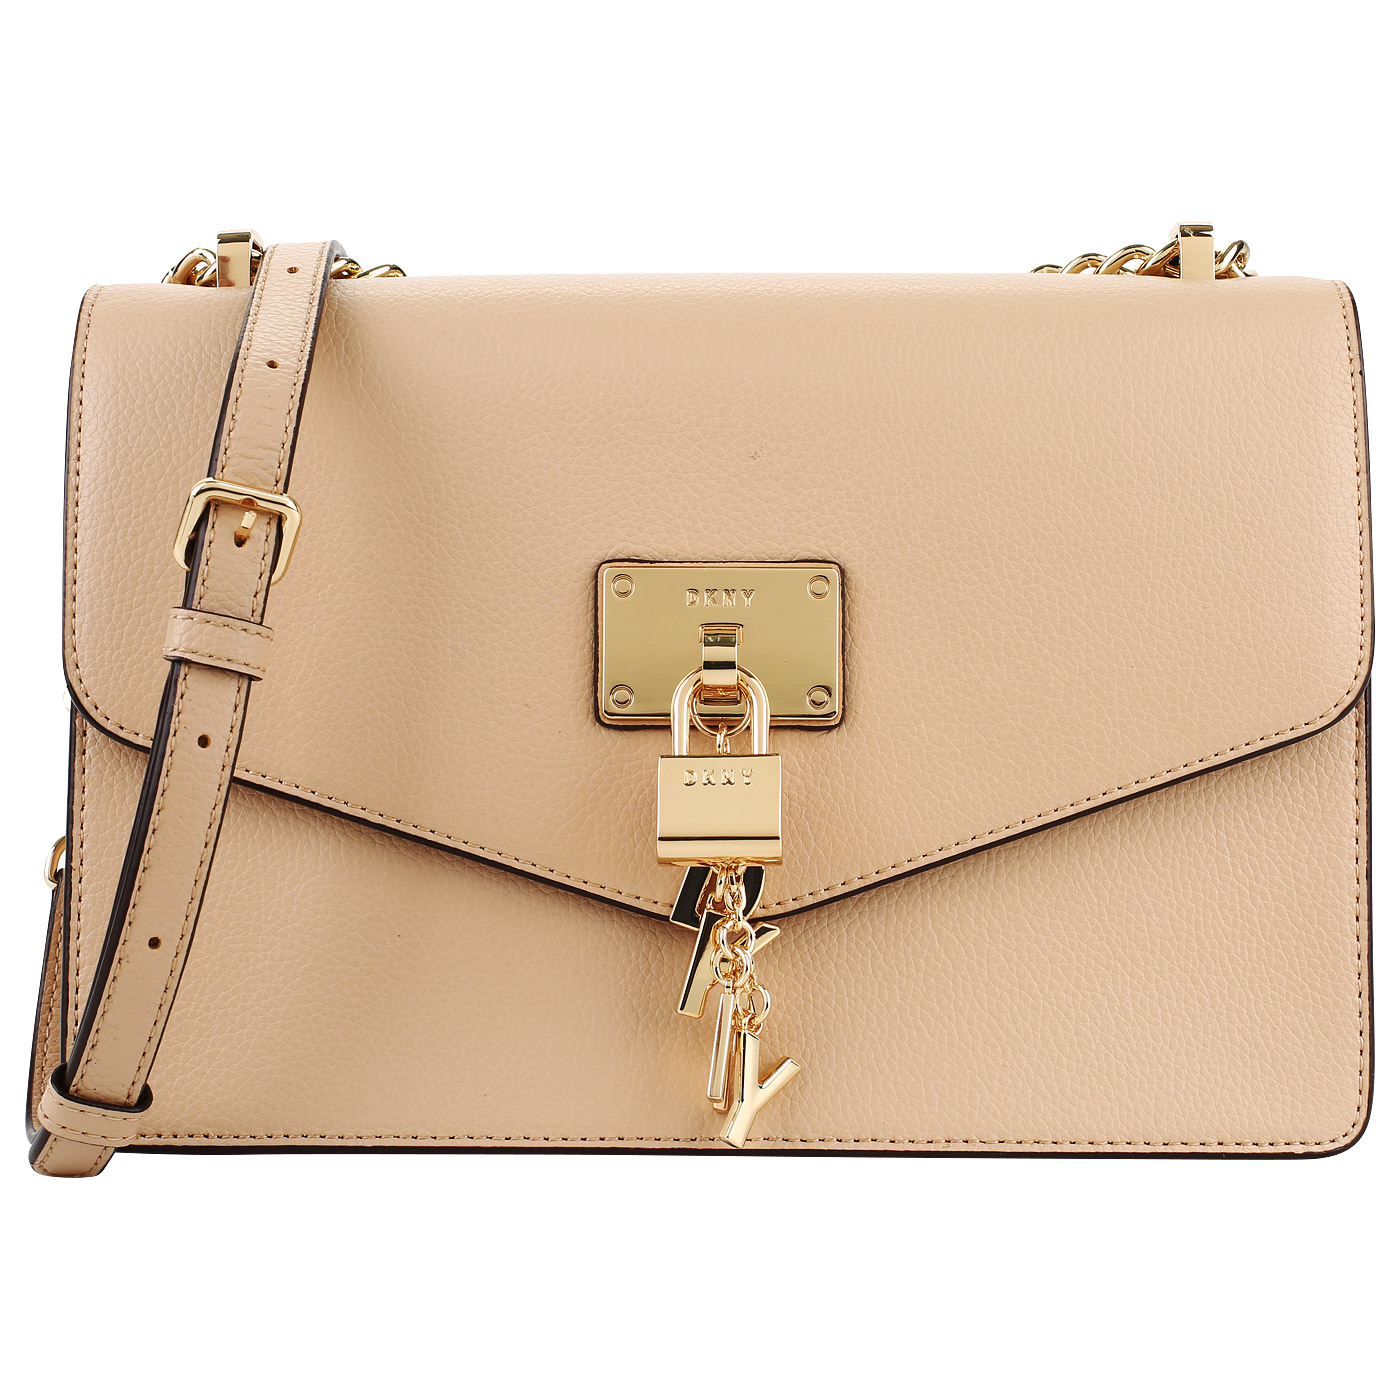 6e9905e7026f Бежевая сумка с откидным клапаном DKNY Elissa R813H281-273 ...